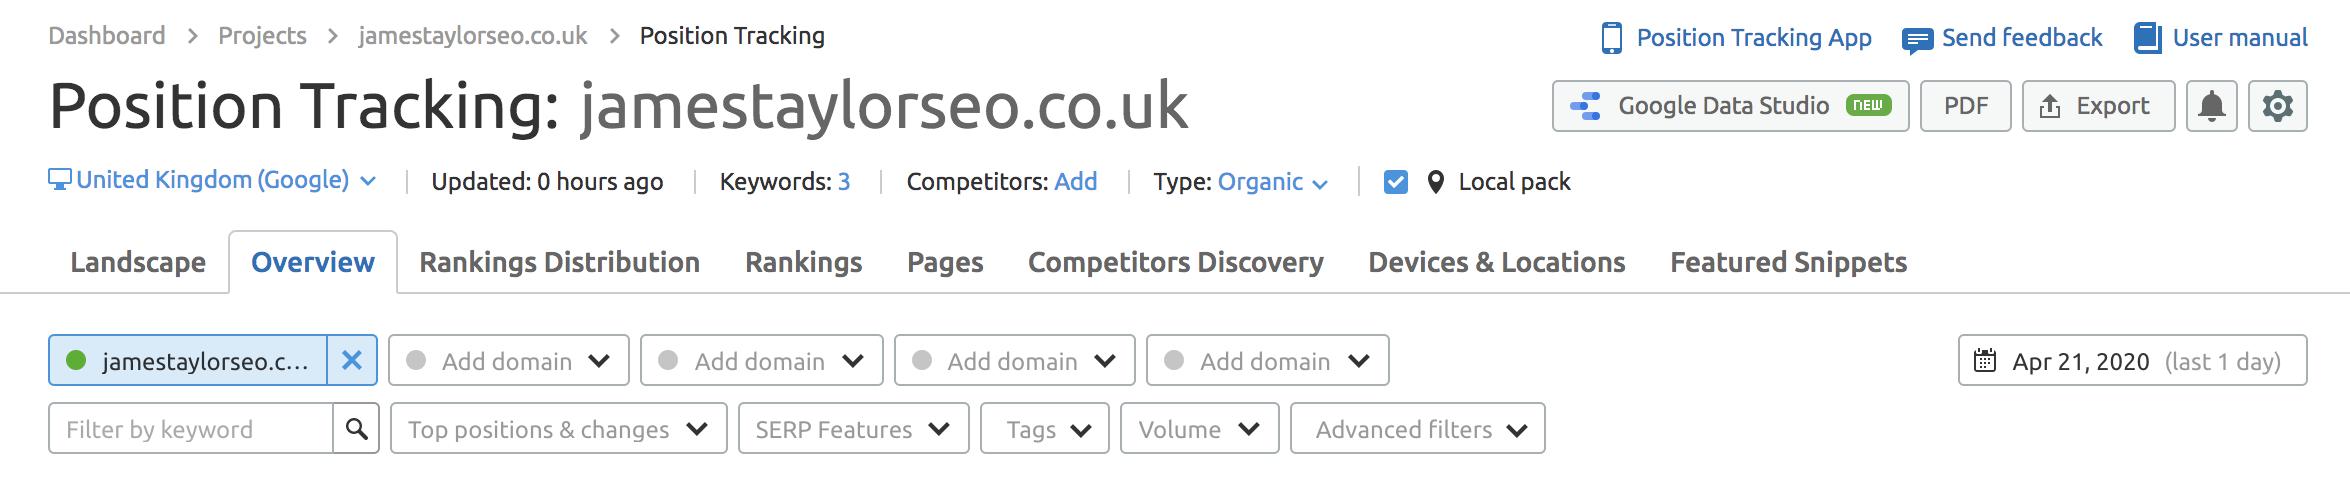 Keyword Tracking Dashboard Top Image